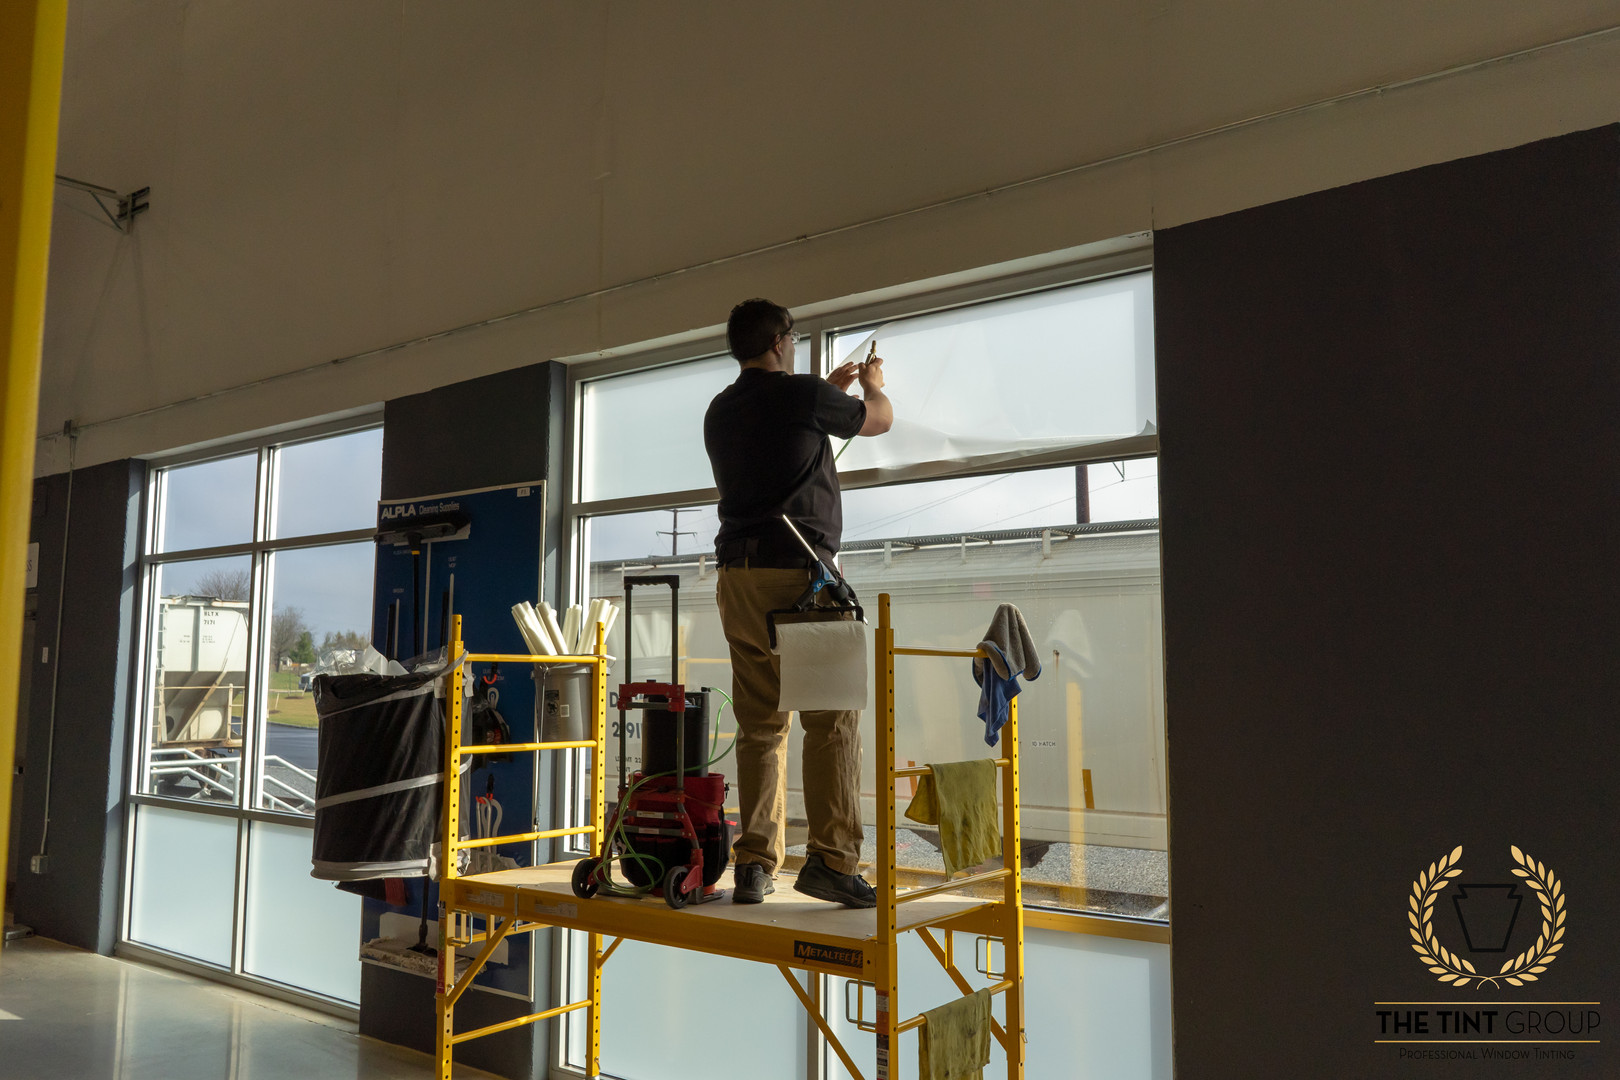 Safety film install